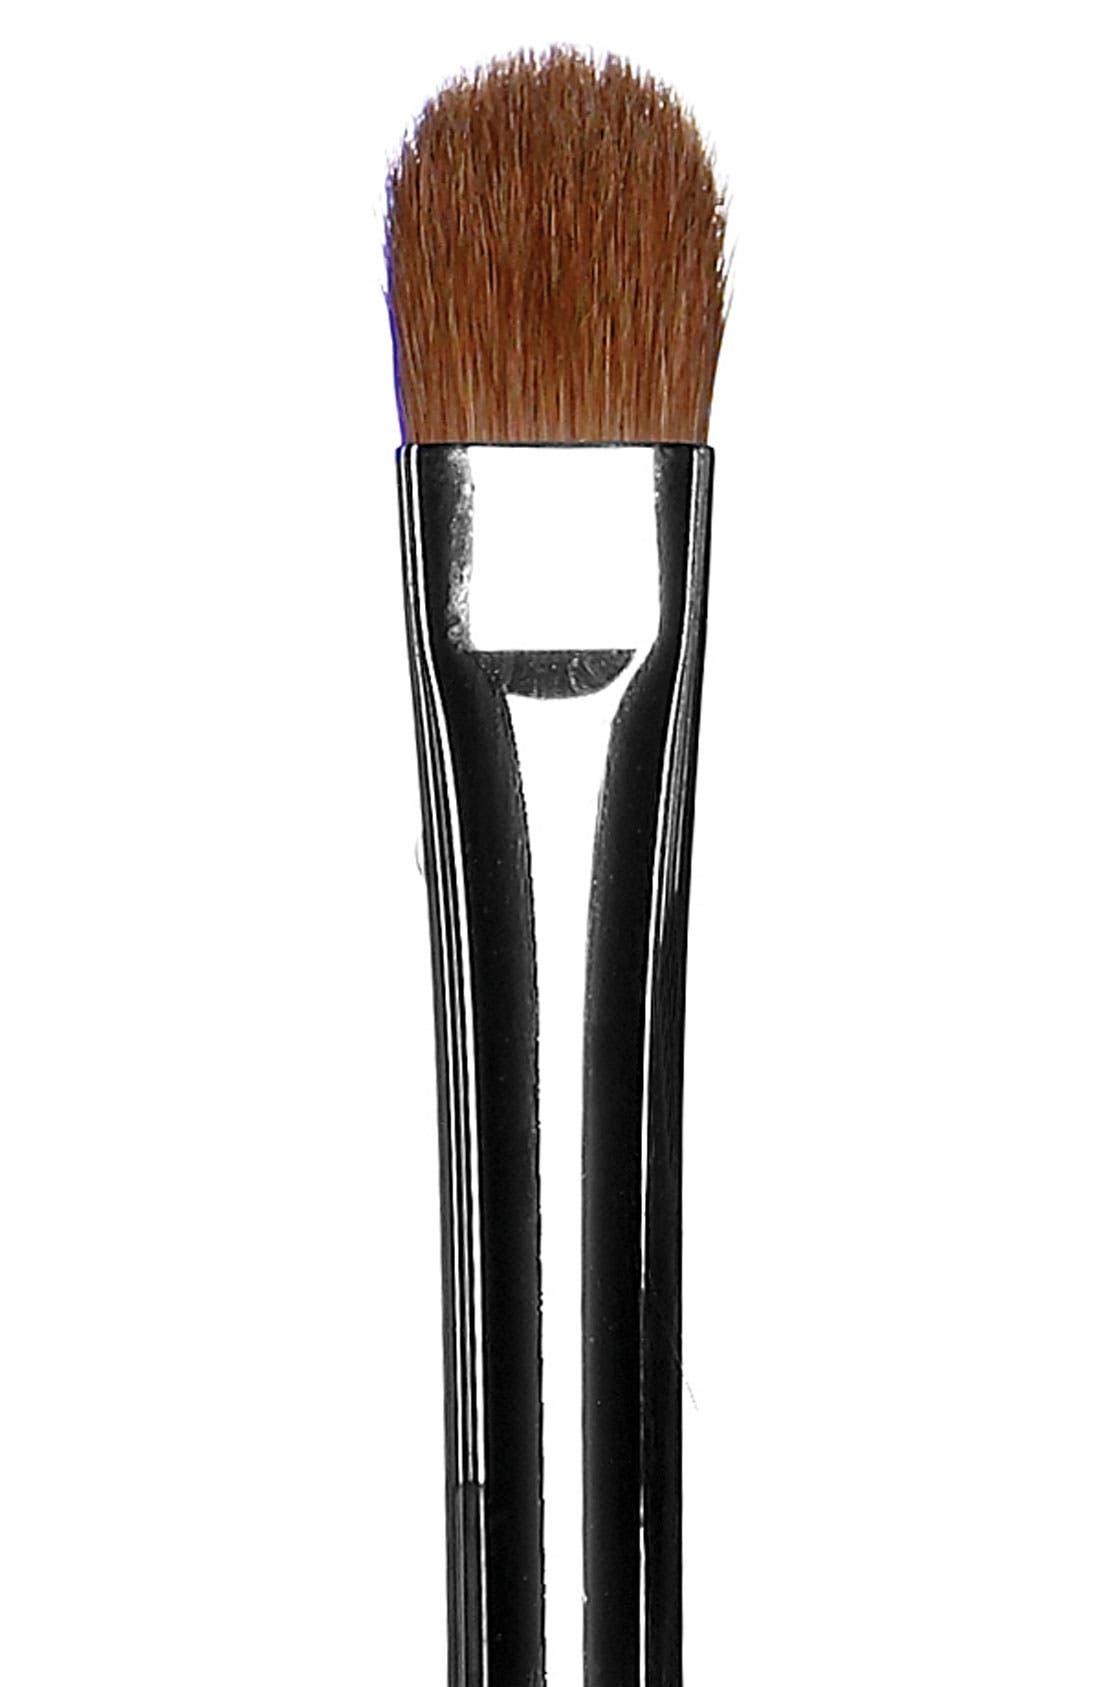 #19 Small Laydown Brush,                             Alternate thumbnail 2, color,                             NO COLOR